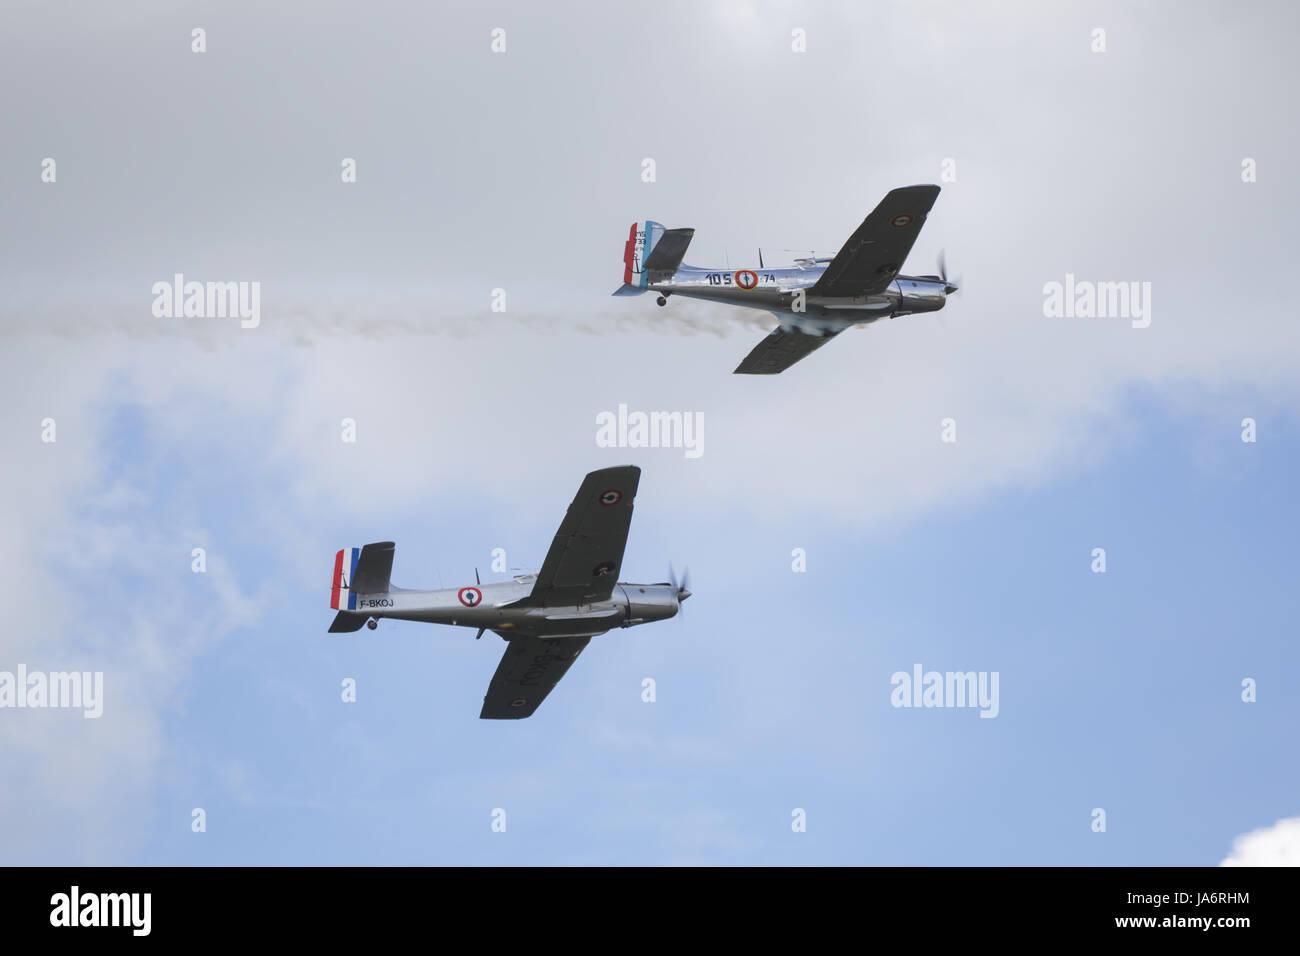 La Ferte Alais, France. 4th June, 2017. Morane-Saulnier Alcyons in the skies above the Aerodrome de Cerny, La Ferte - Stock Image